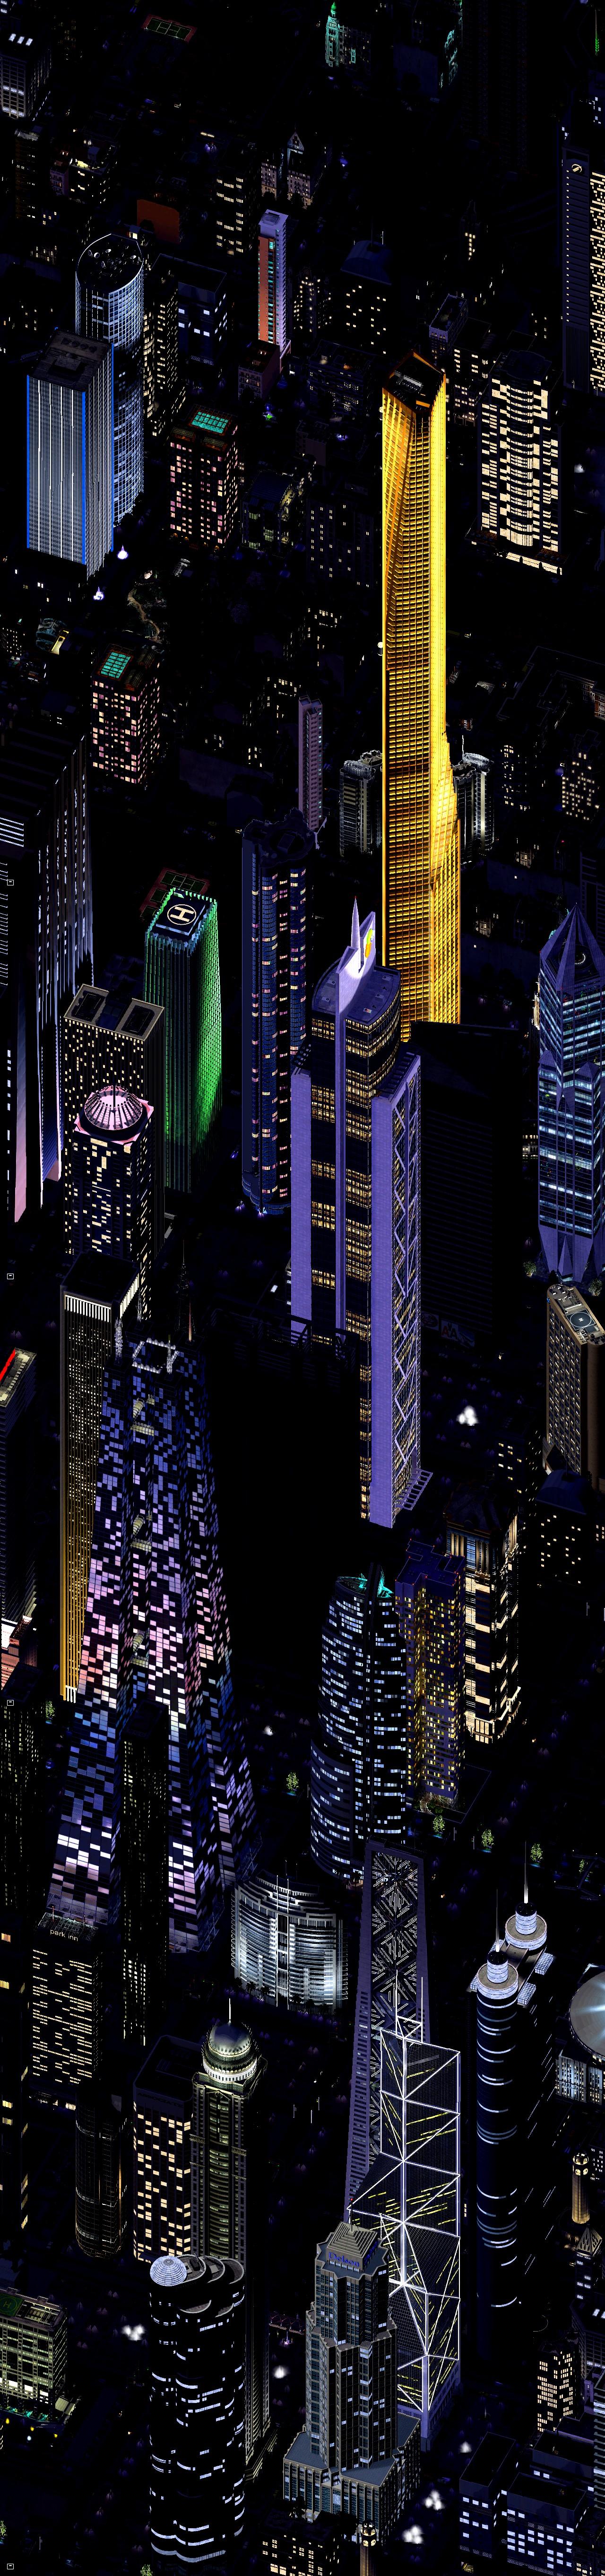 engler__sc4_city__by_alejandro24-d40hx45.jpg